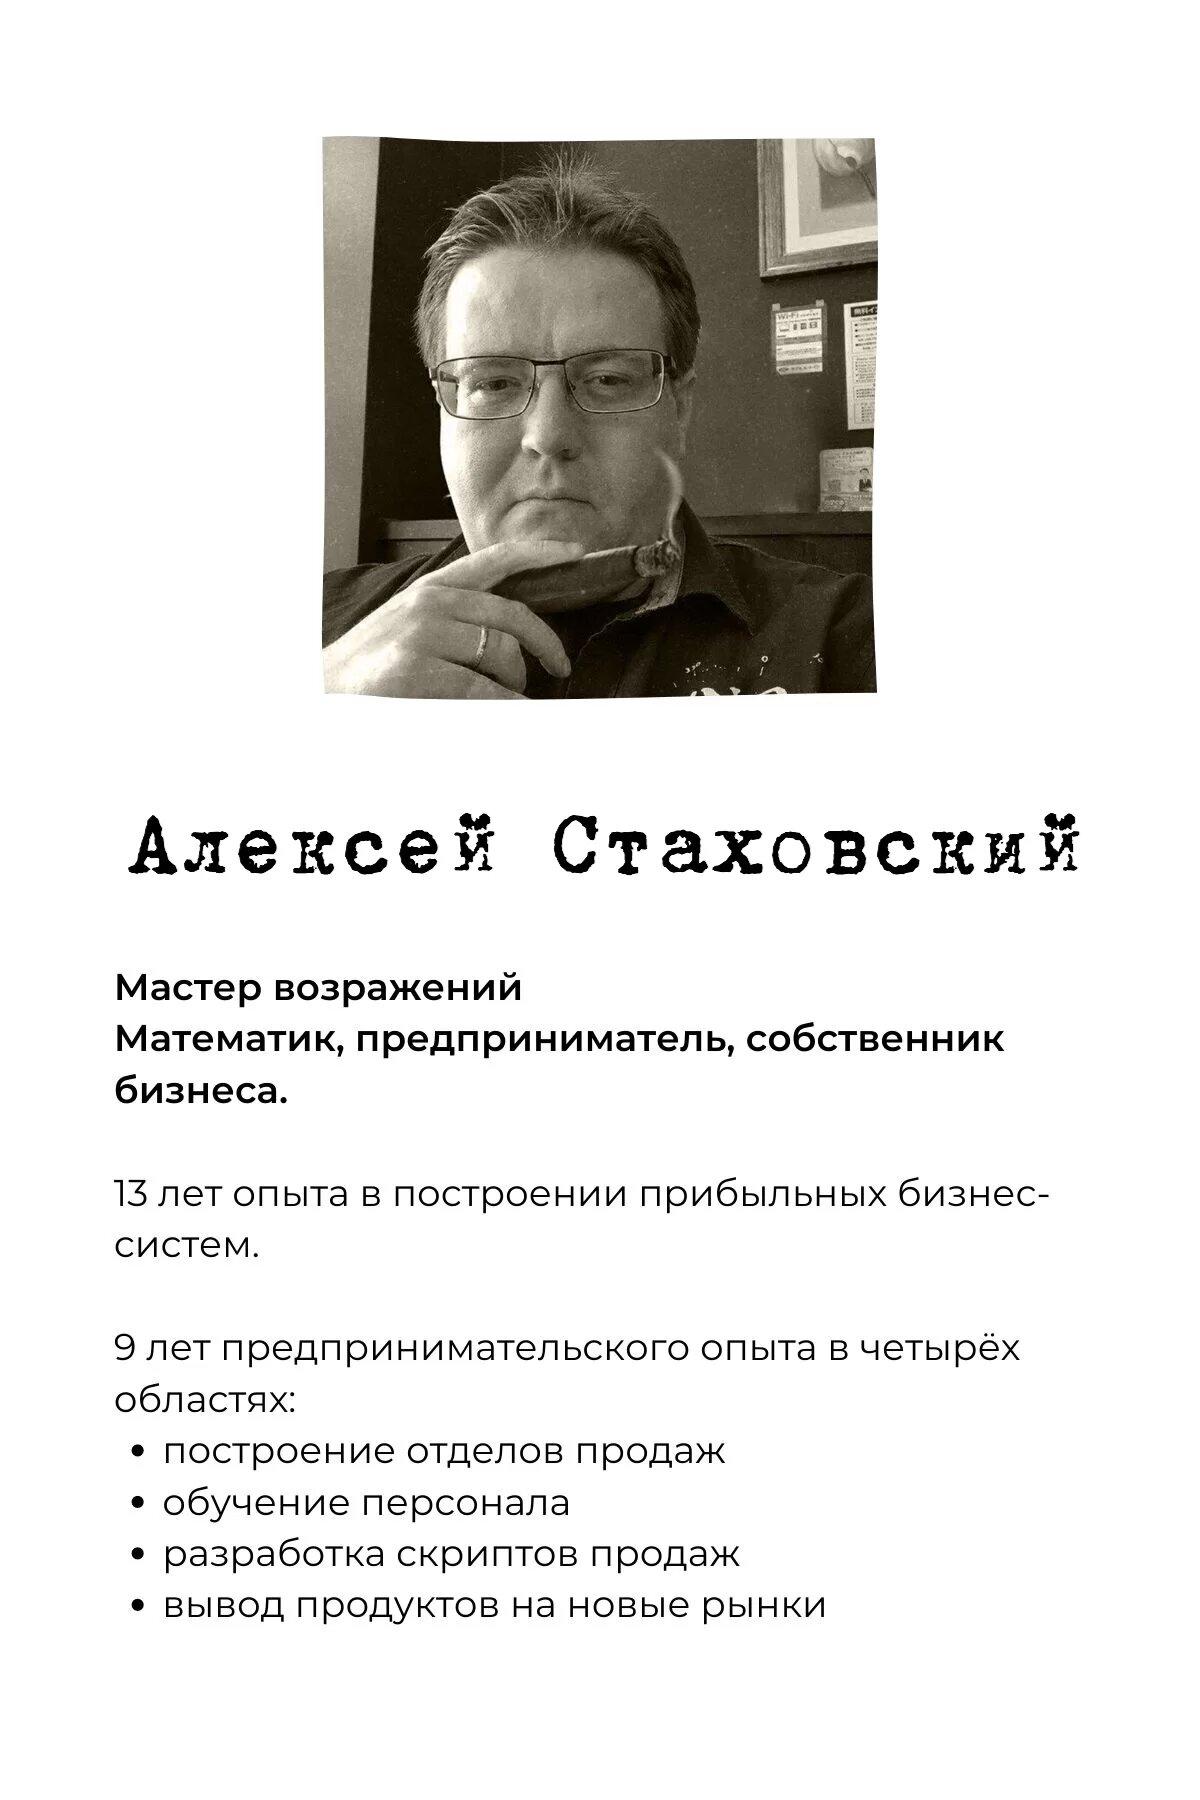 _25042020_13_11_10